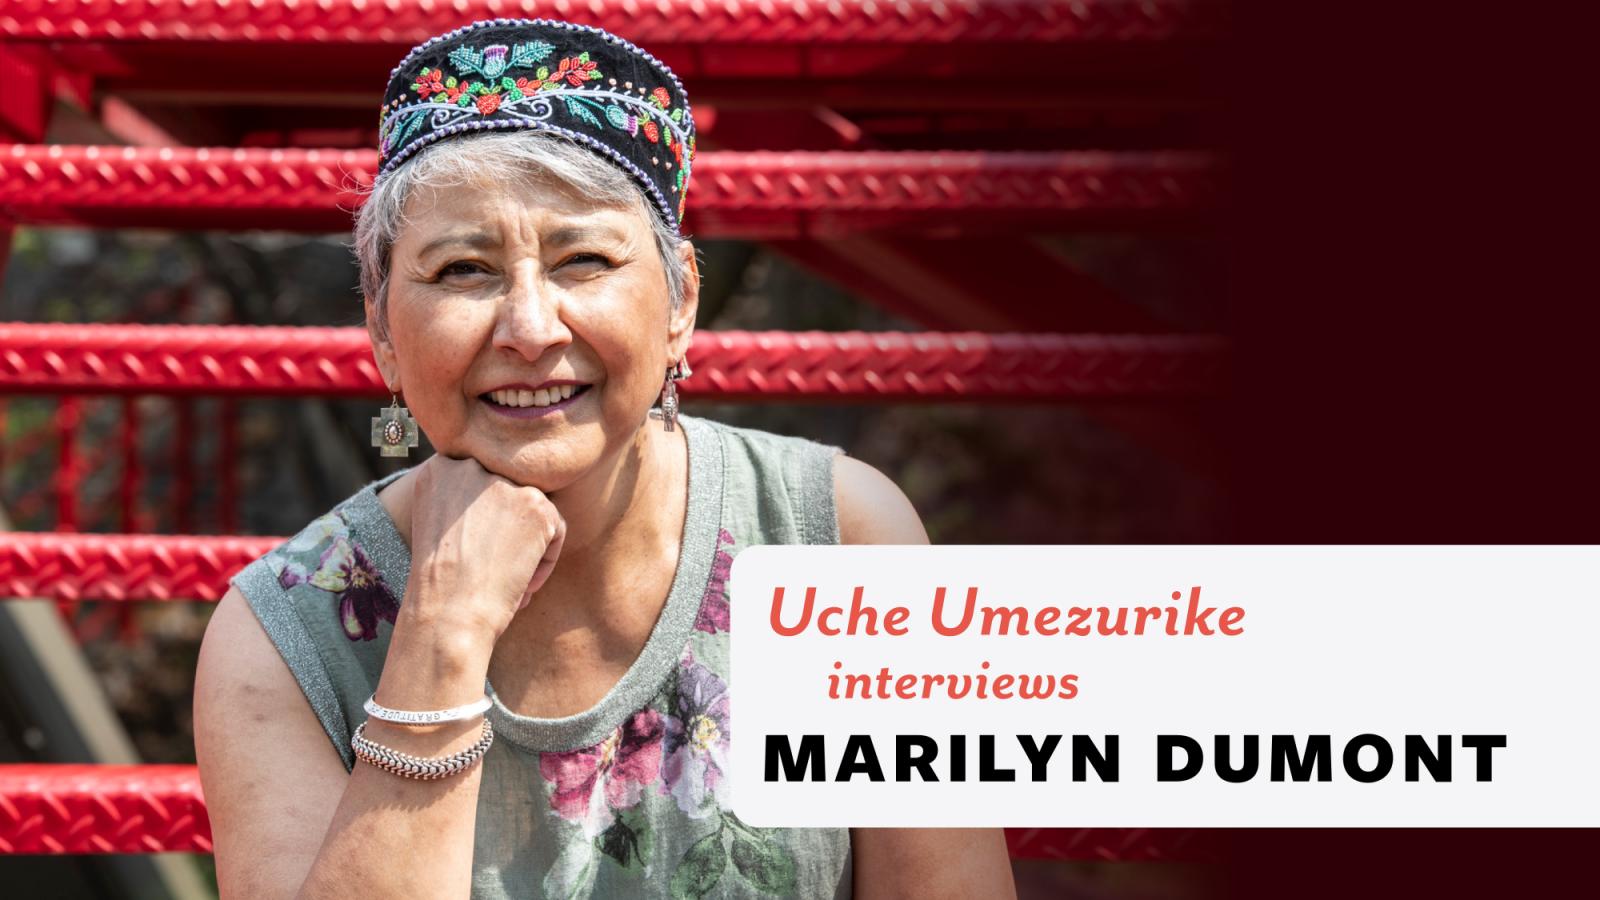 Author photo of Marilyn Dumont